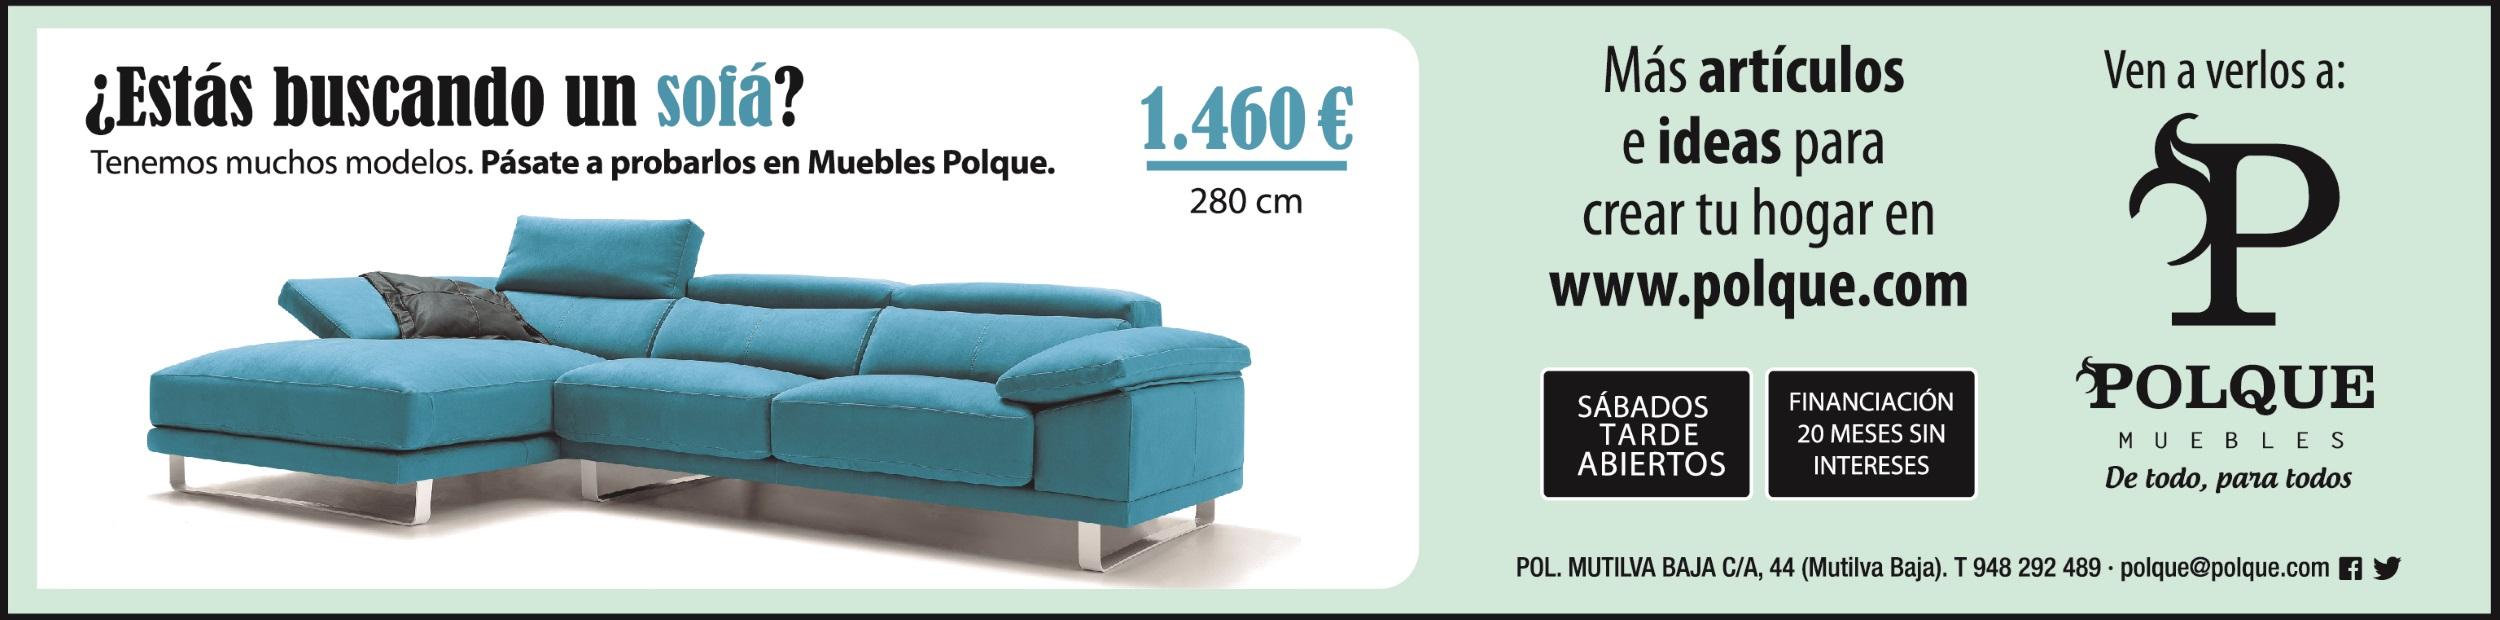 Muebles en navarra ideas de disenos for Muebles polque